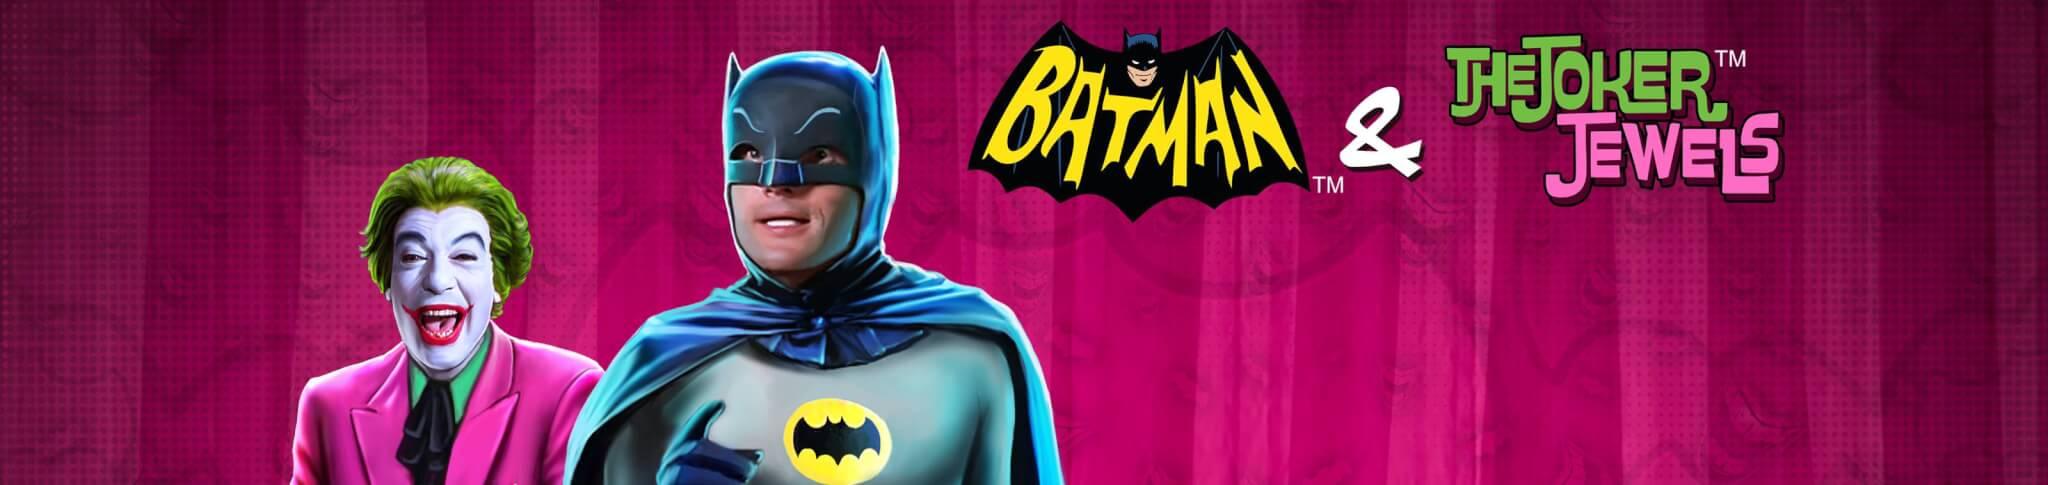 Batman_JokerJewels_slot